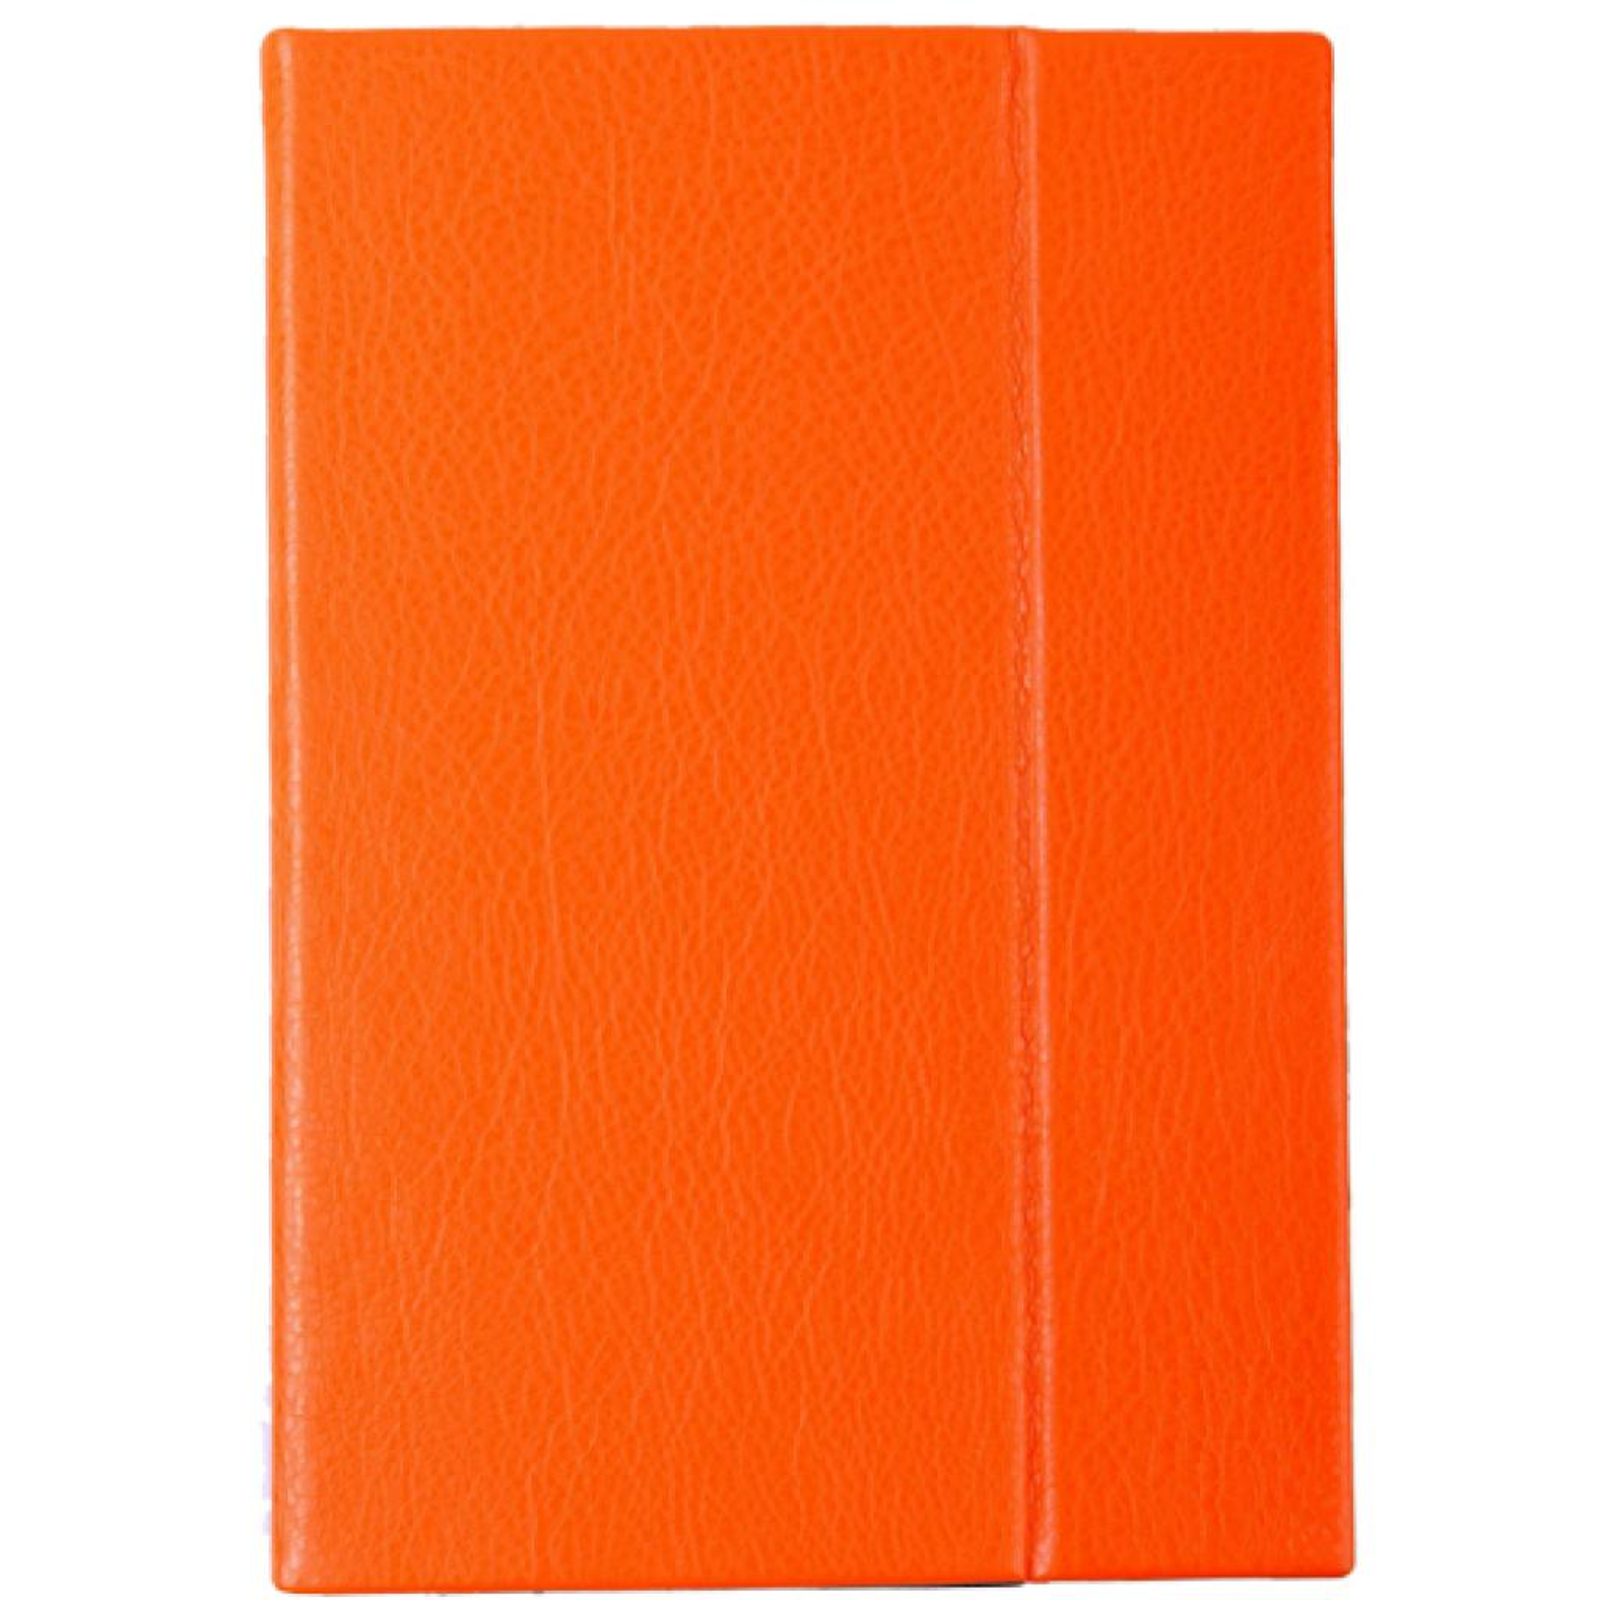 Чехол для планшета Vento 9.7 Desire Bright - orange изображение 2